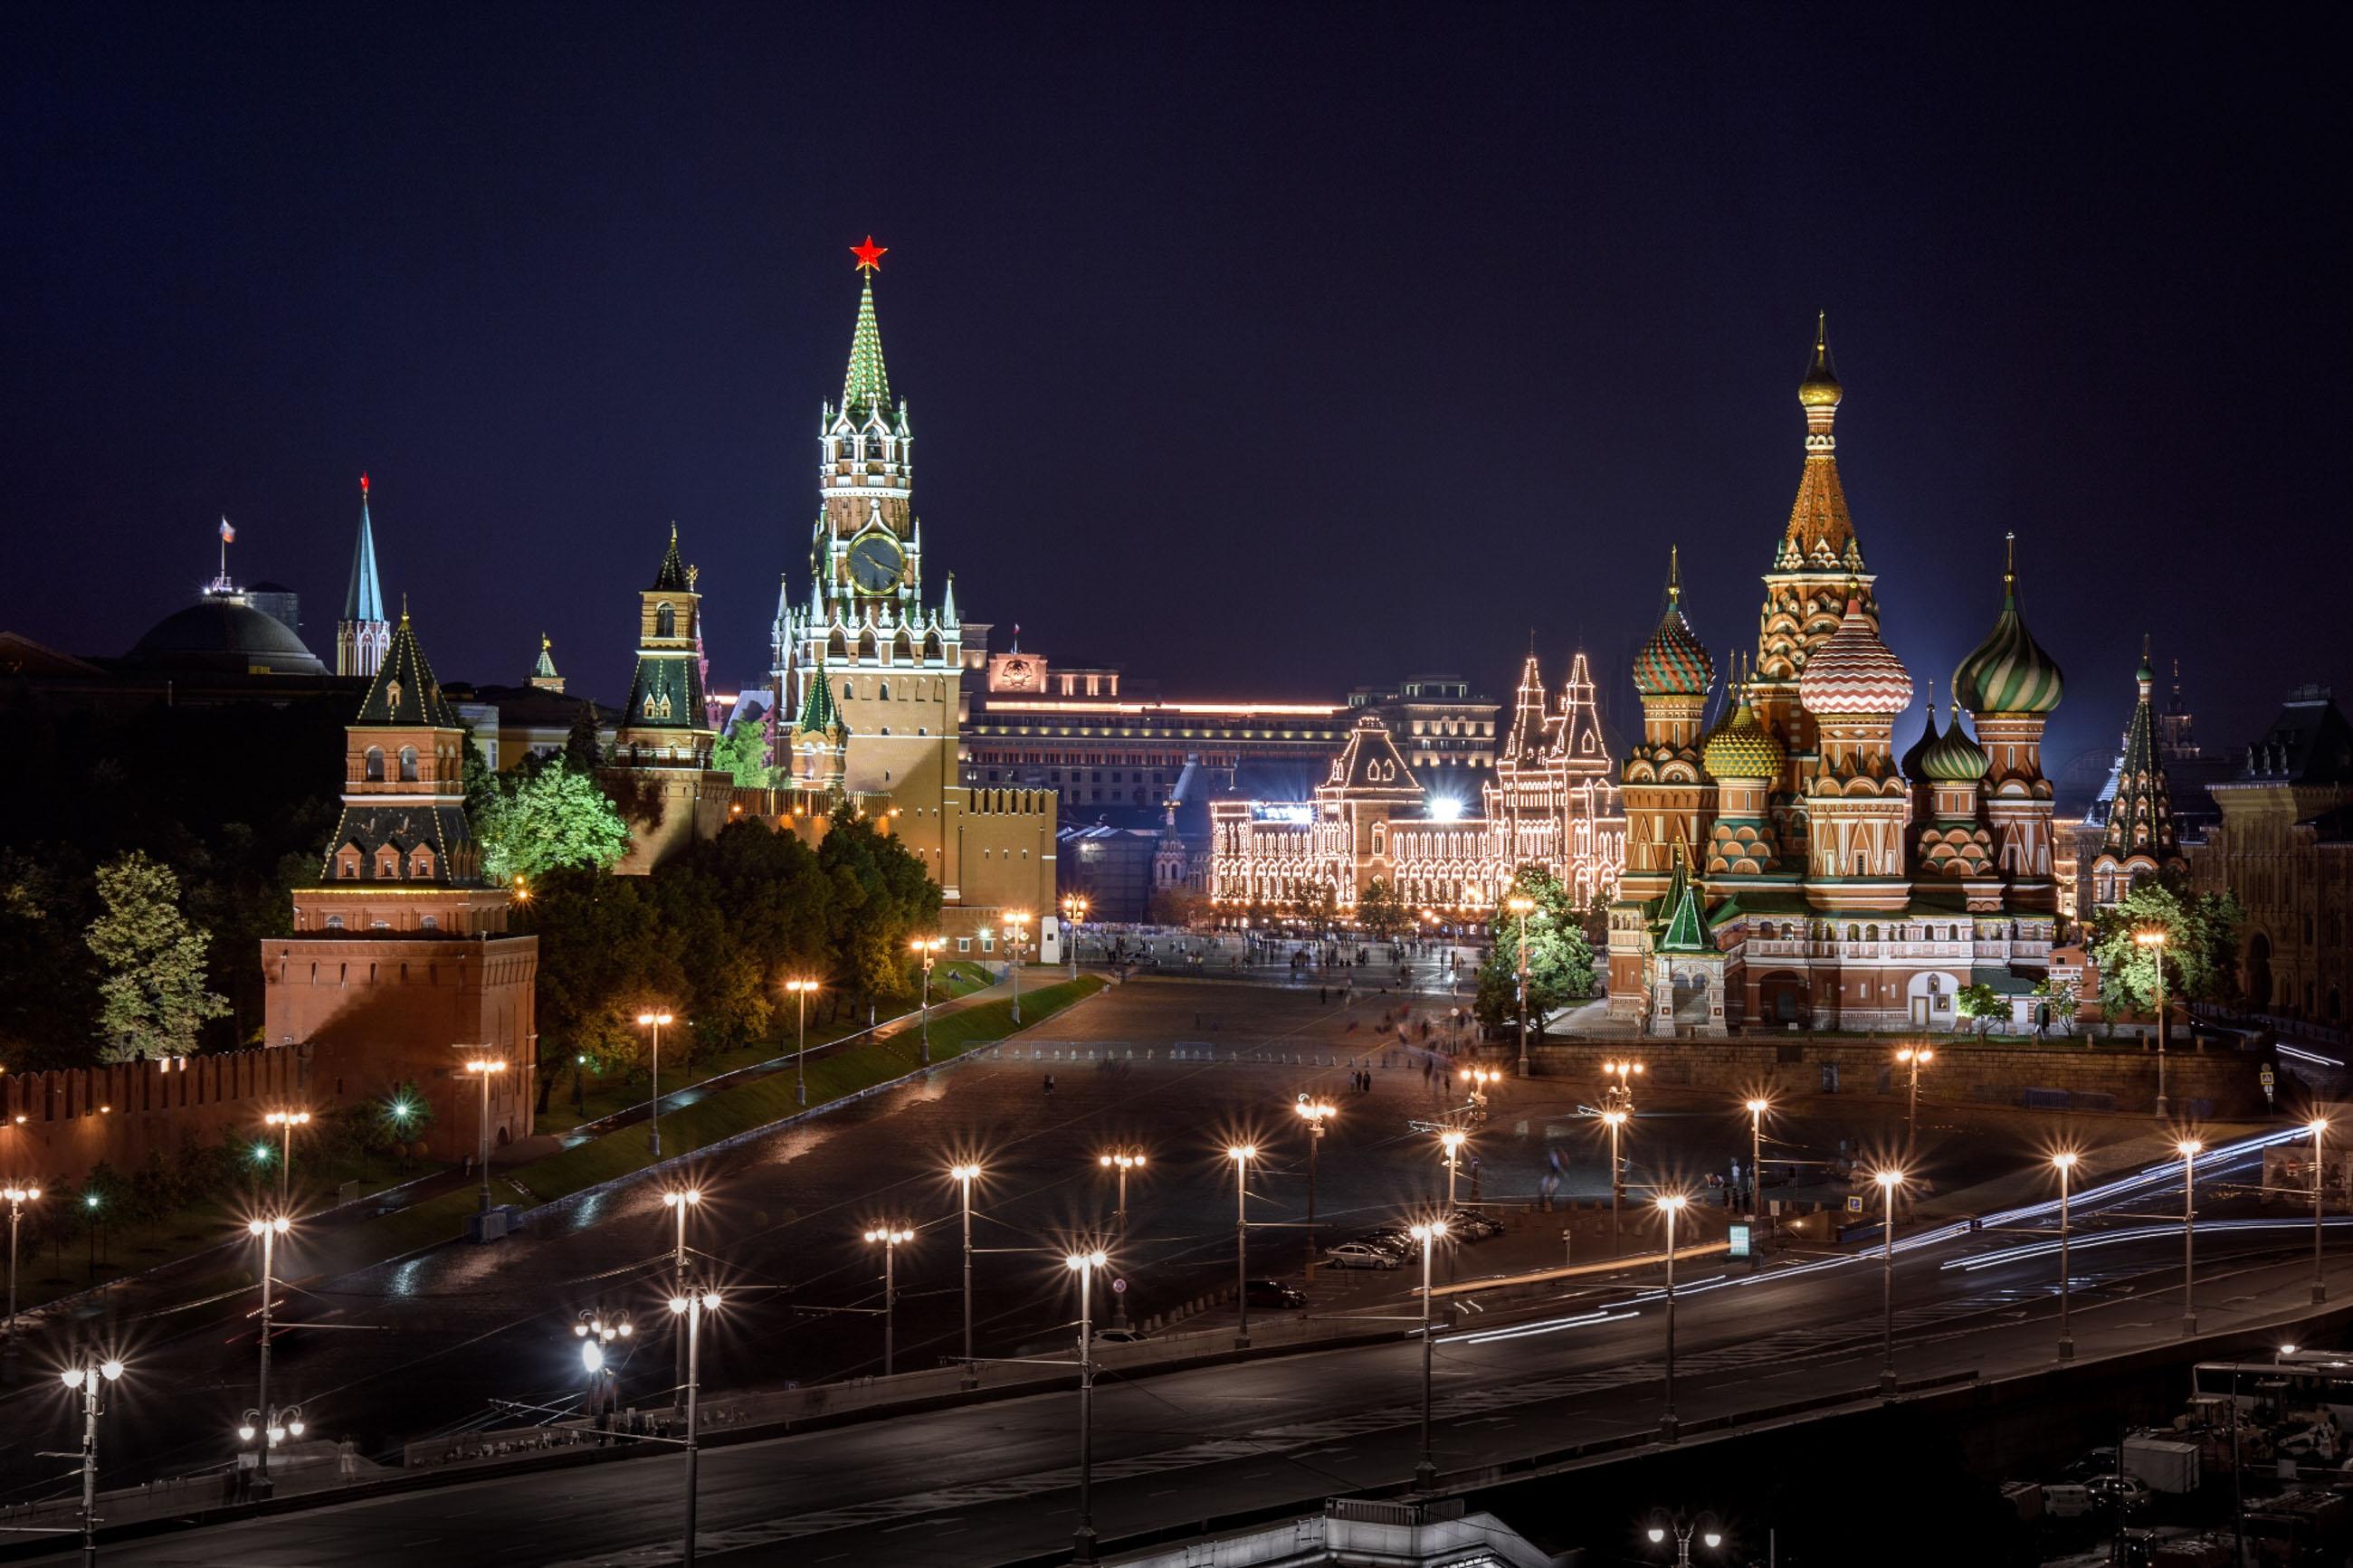 https://bubo.sk/uploads/galleries/5055/kempinski_moskva_rusko_view_large.jpg